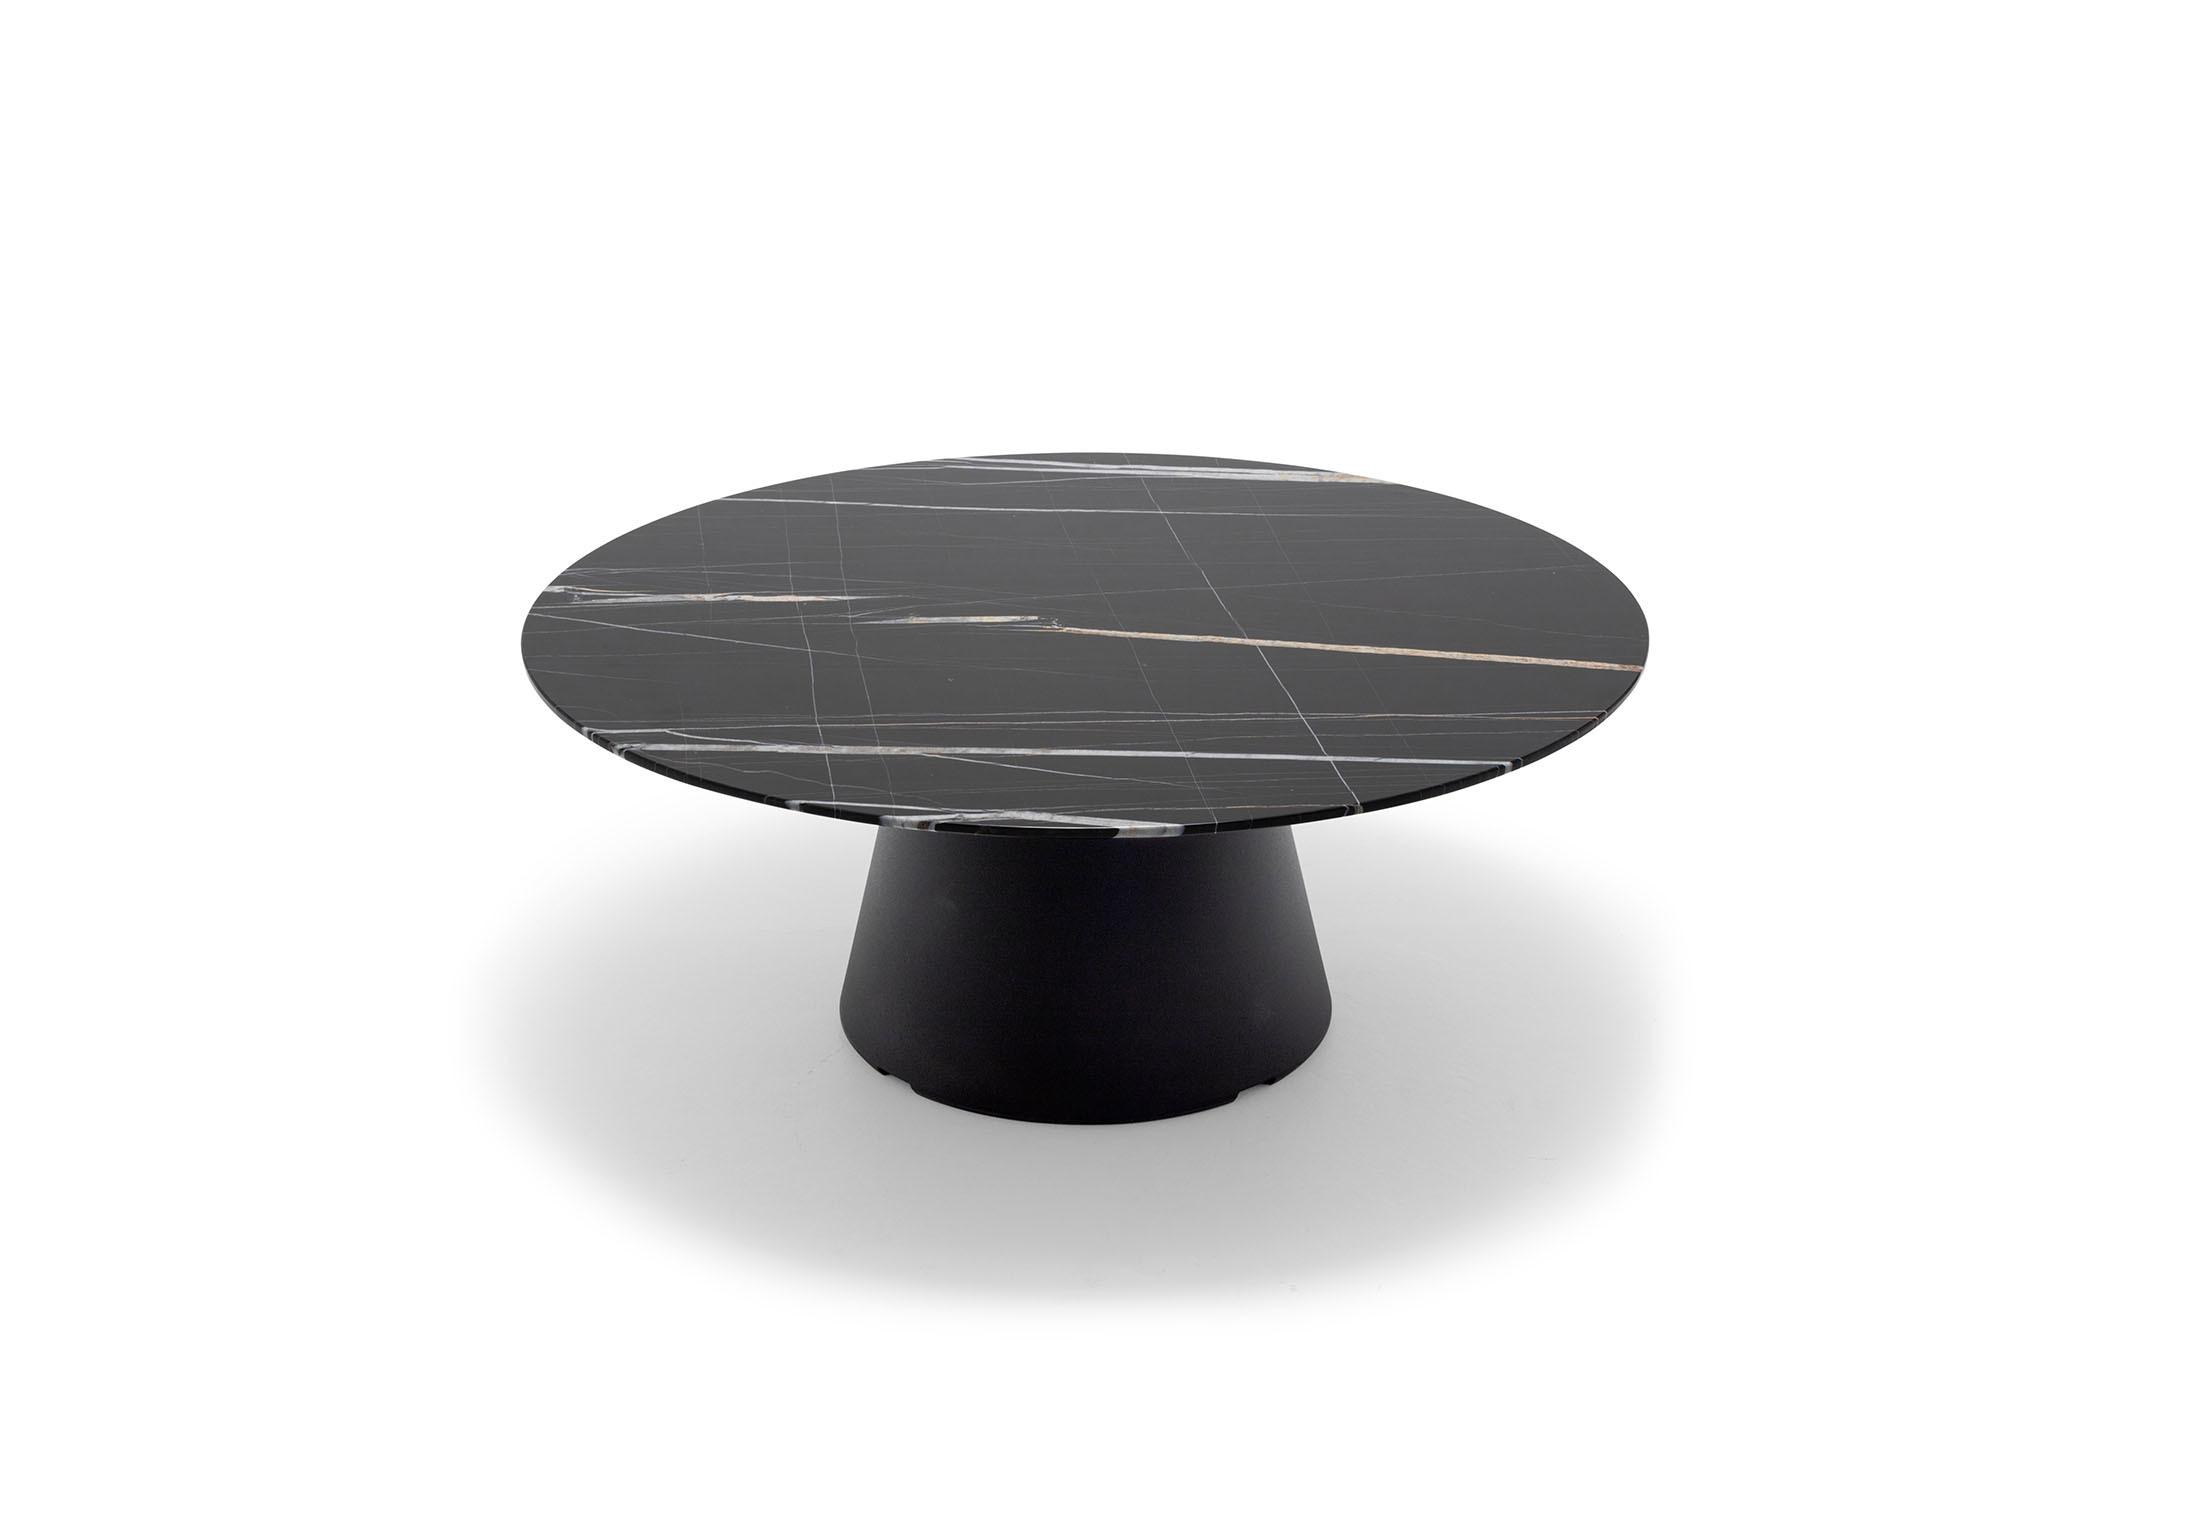 AndreuWorld REVERSEoccasionaltable PiergiorgioCazzaniga 3 Image Result For Marble Top Coffee Table